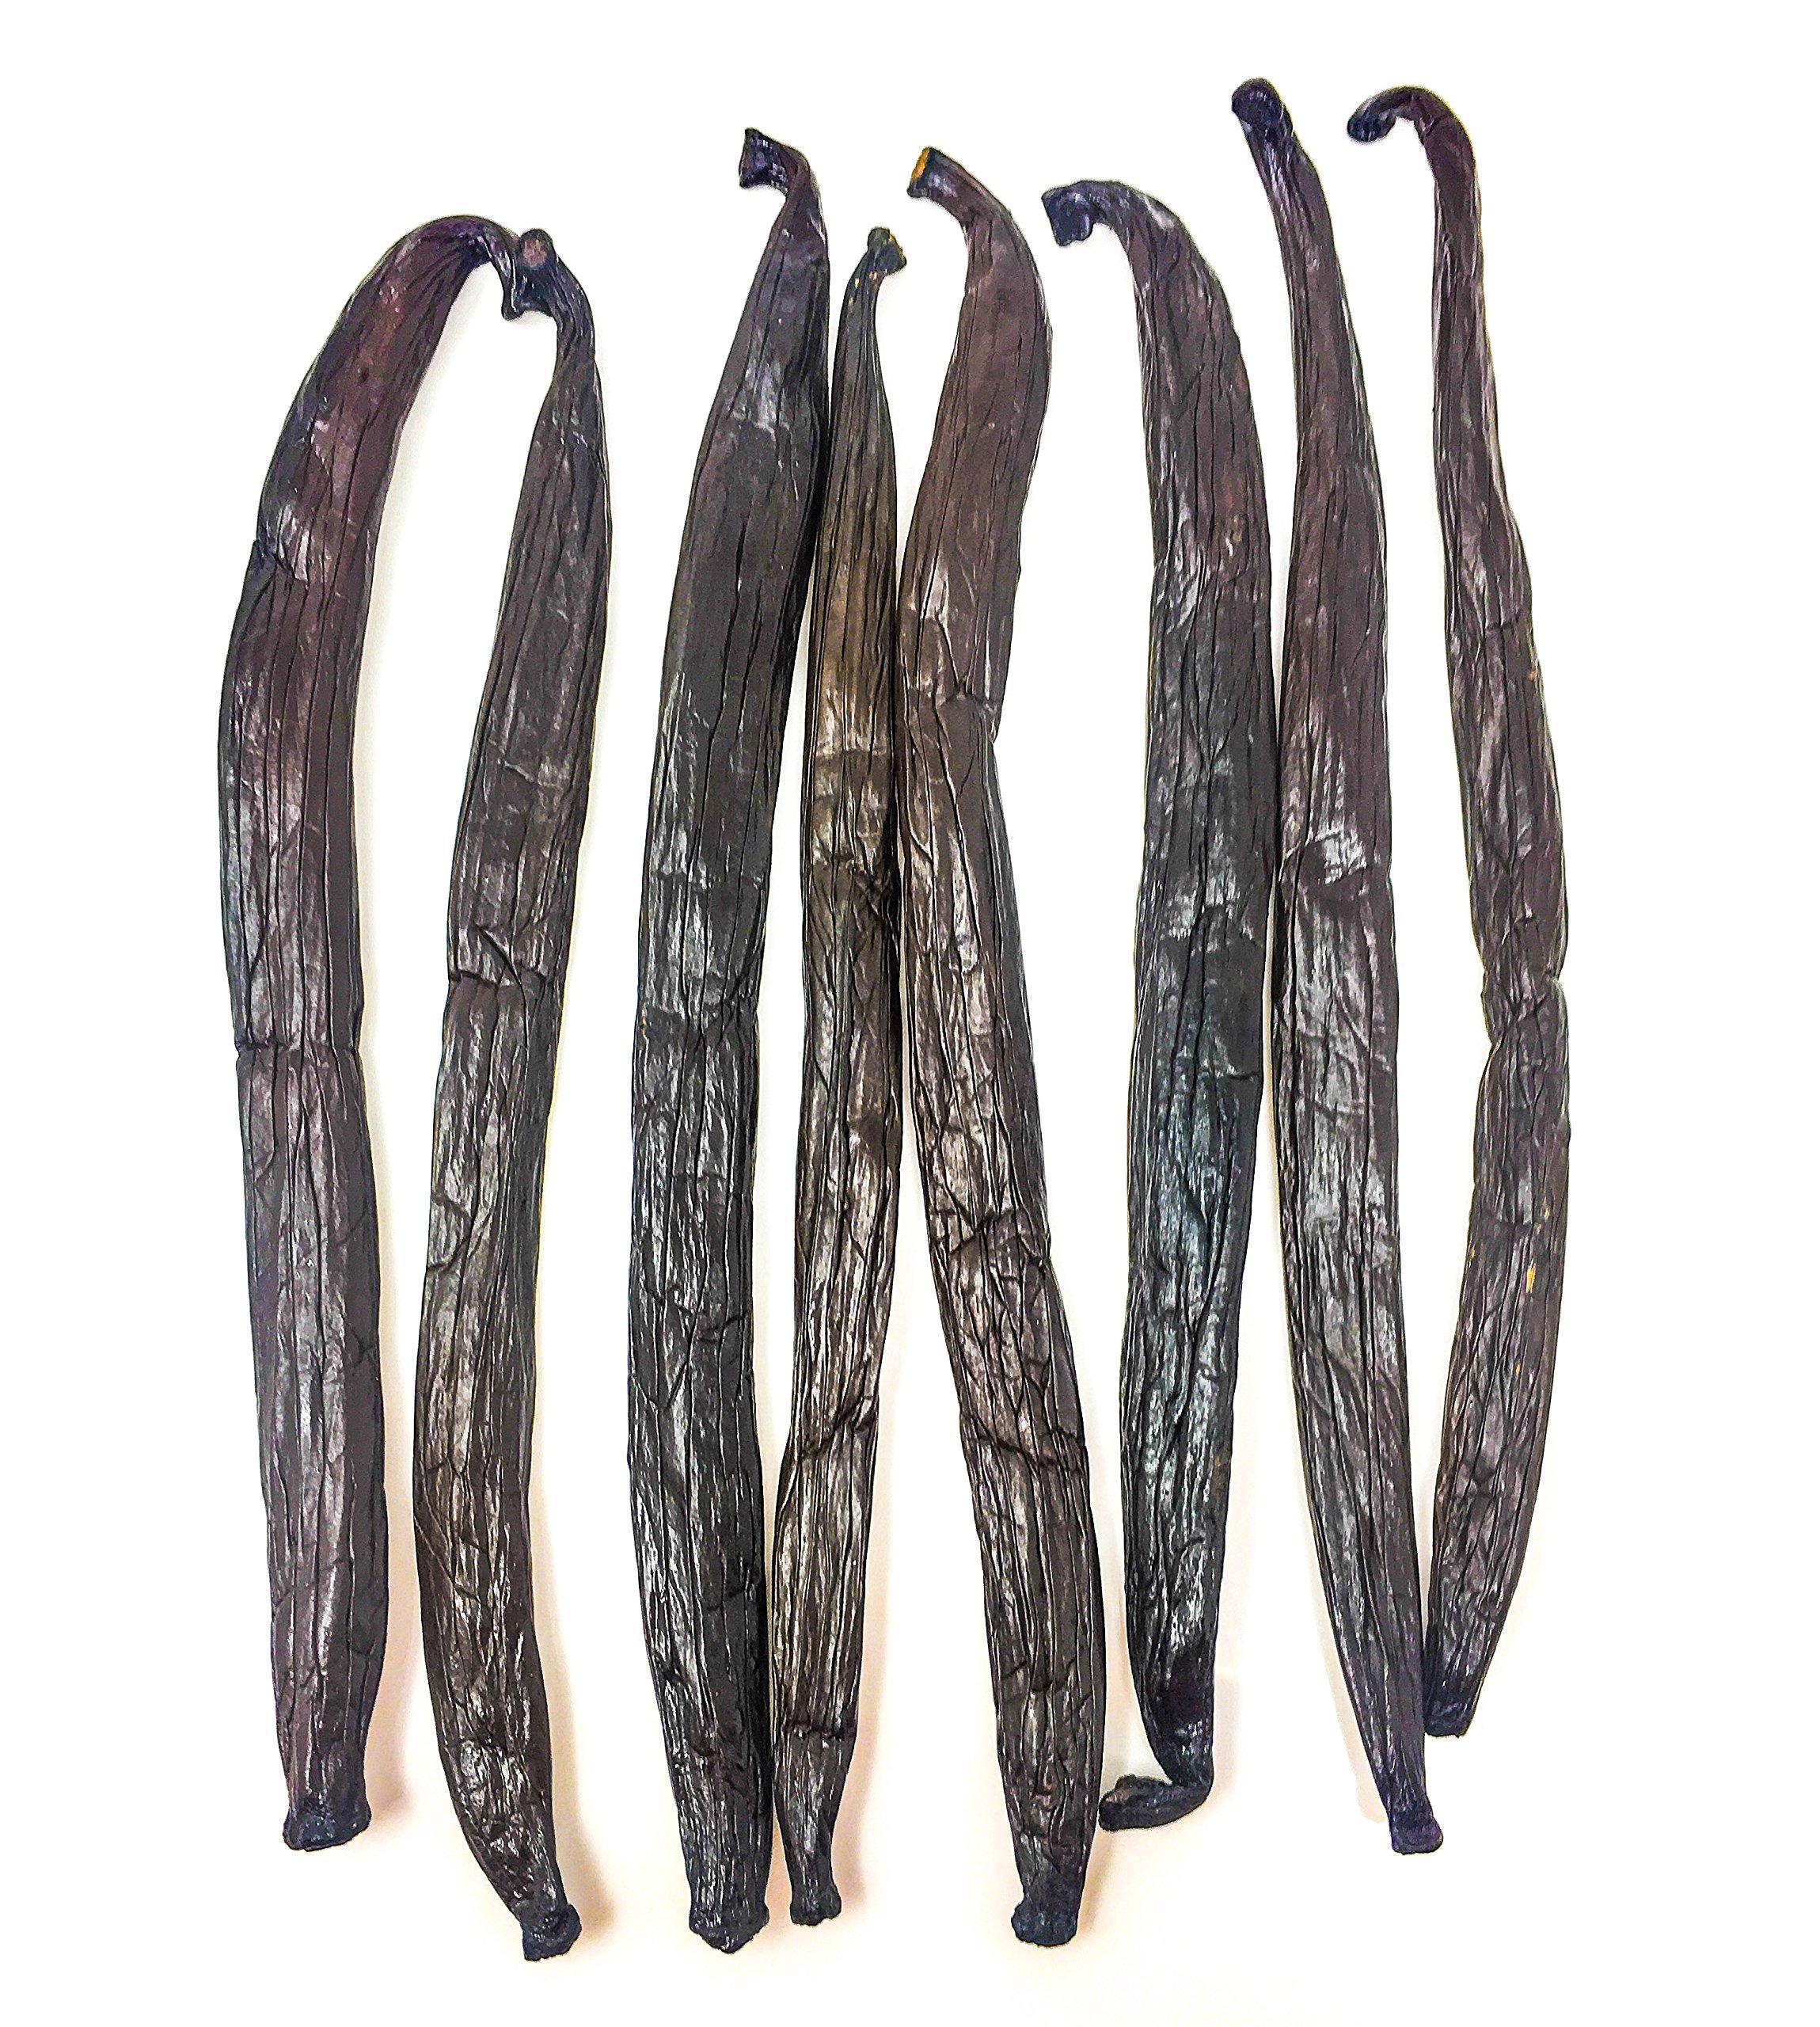 Tahitian Vanilla Beans by Slofoodgroup, Grade A Tahitian Vanilla Beans (Vanilla Tahitensis), Gourmet Tahitian Vanilla Beans Grown in Tahiti (.25 lb Tahitian Vanilla beans)